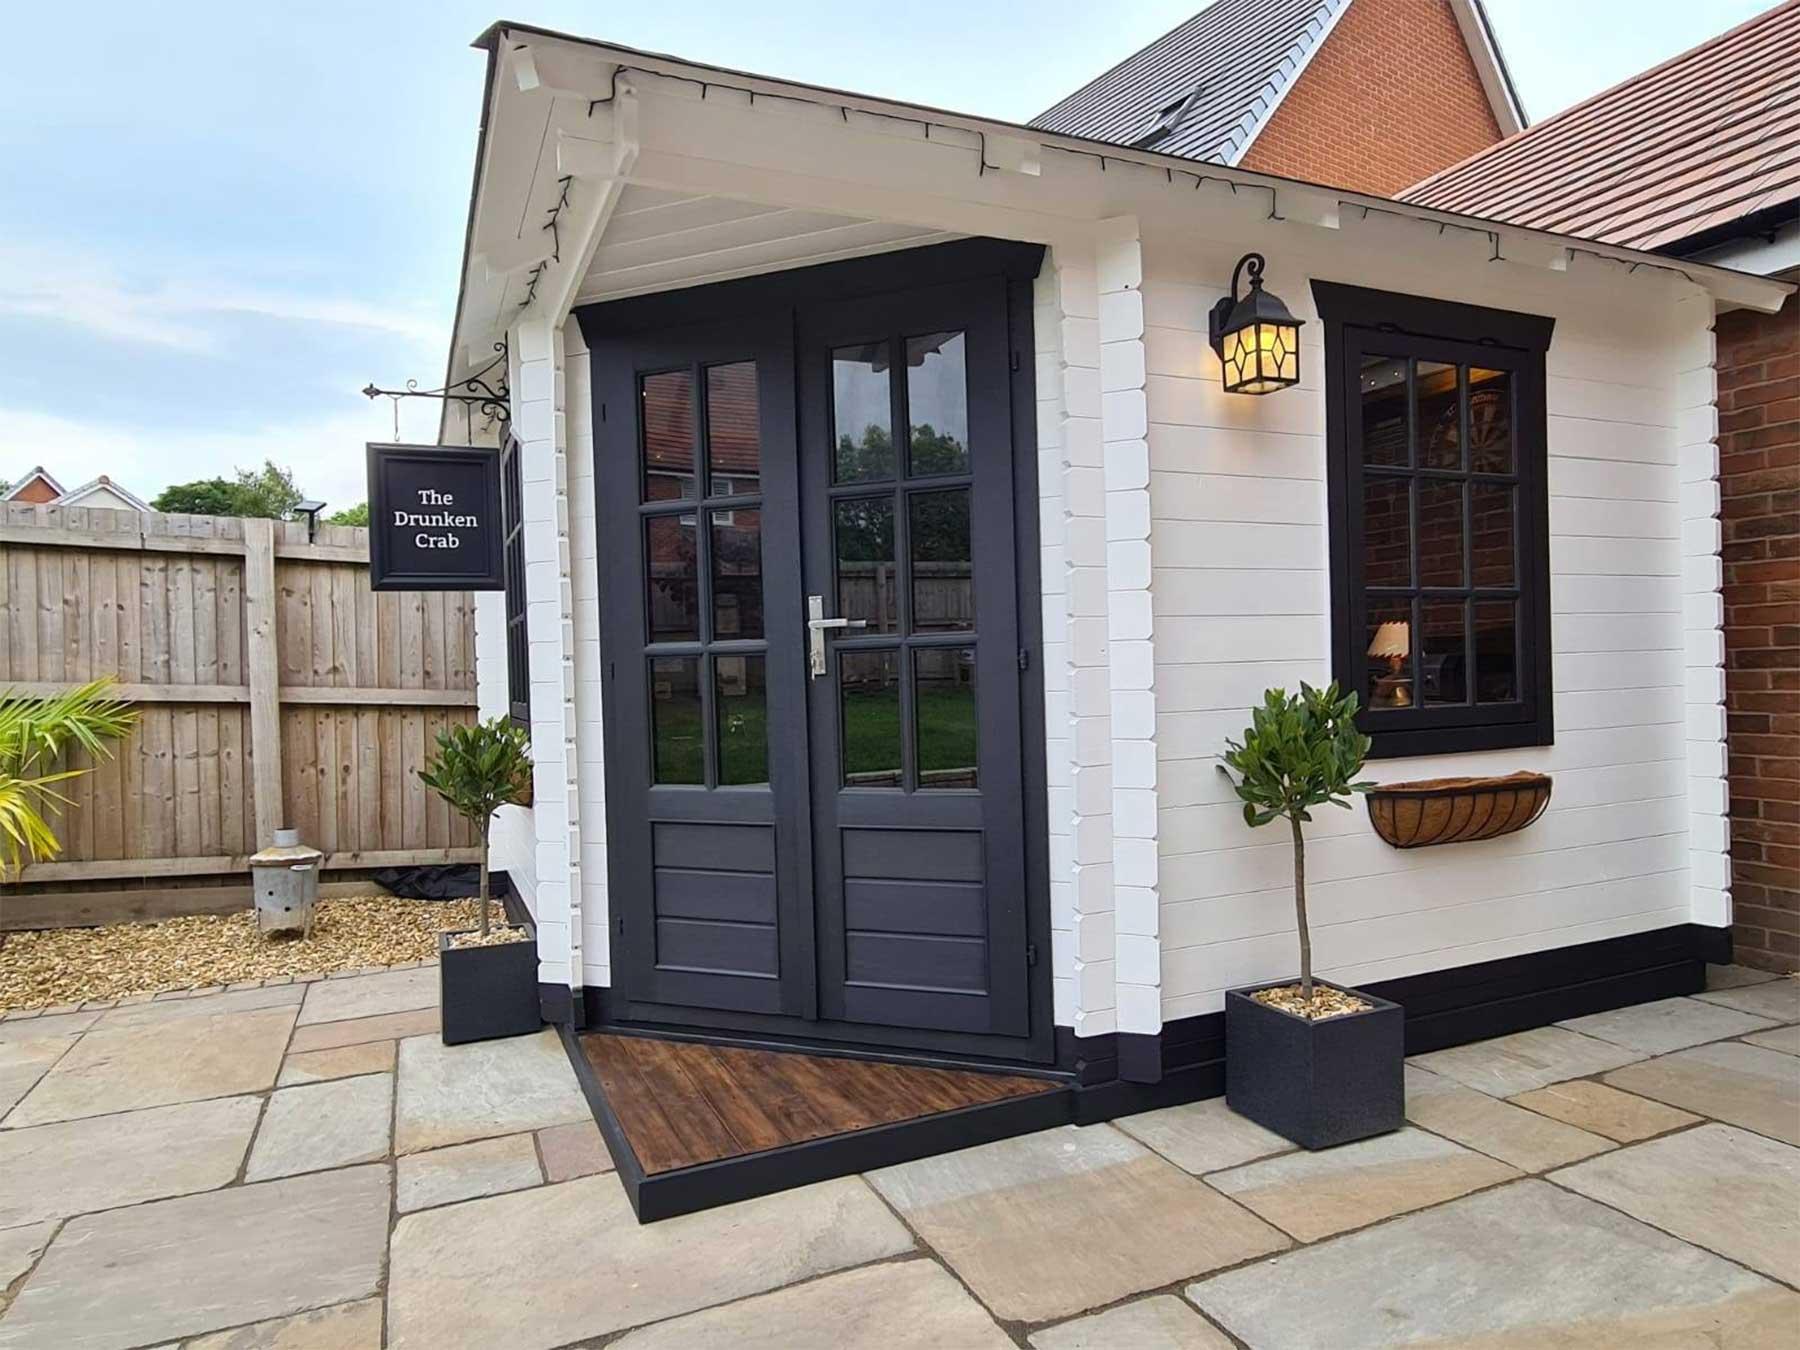 DIY-Mini-Pub im eigenen Garten gebaut the-drunken-crab-privater-pub_11